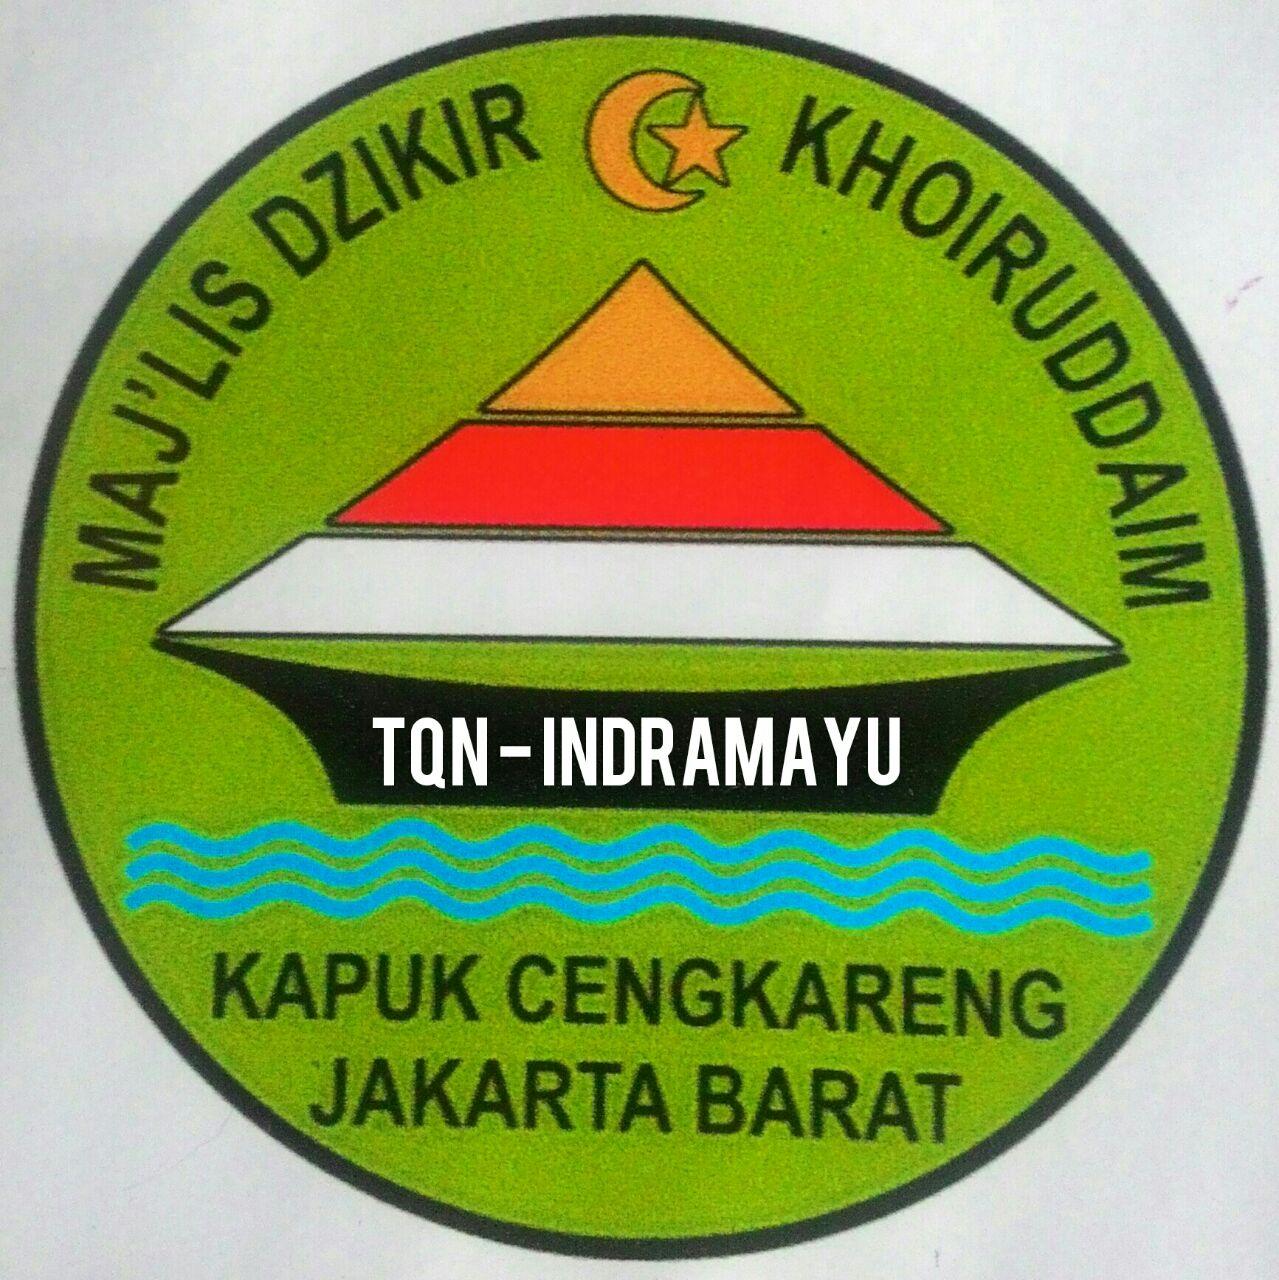 TQN INDRAMAYU